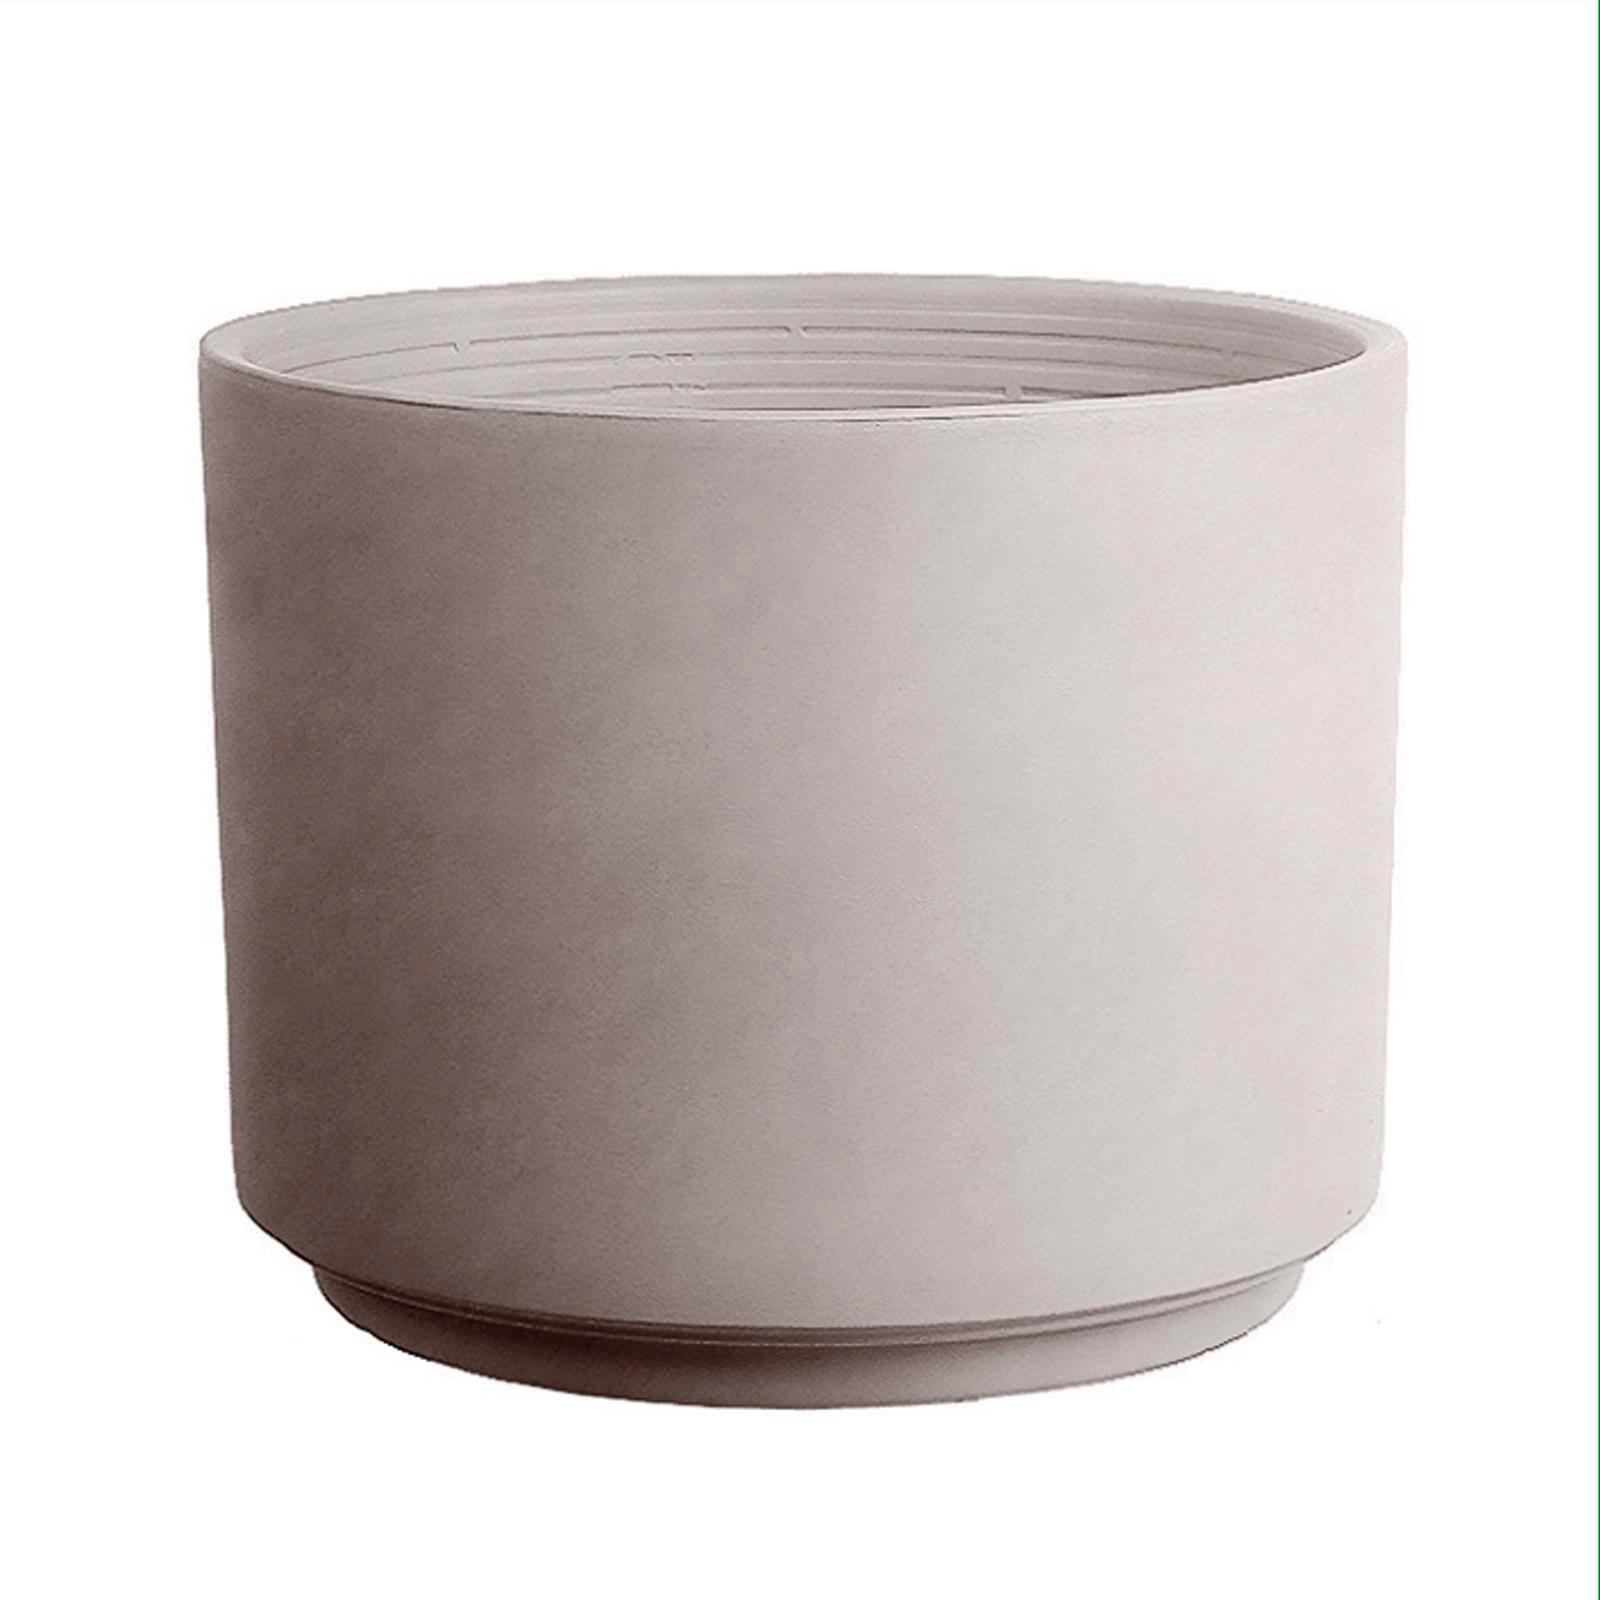 Northcote Pottery 15cm Italian Greige Terracotta Cylinder Pot